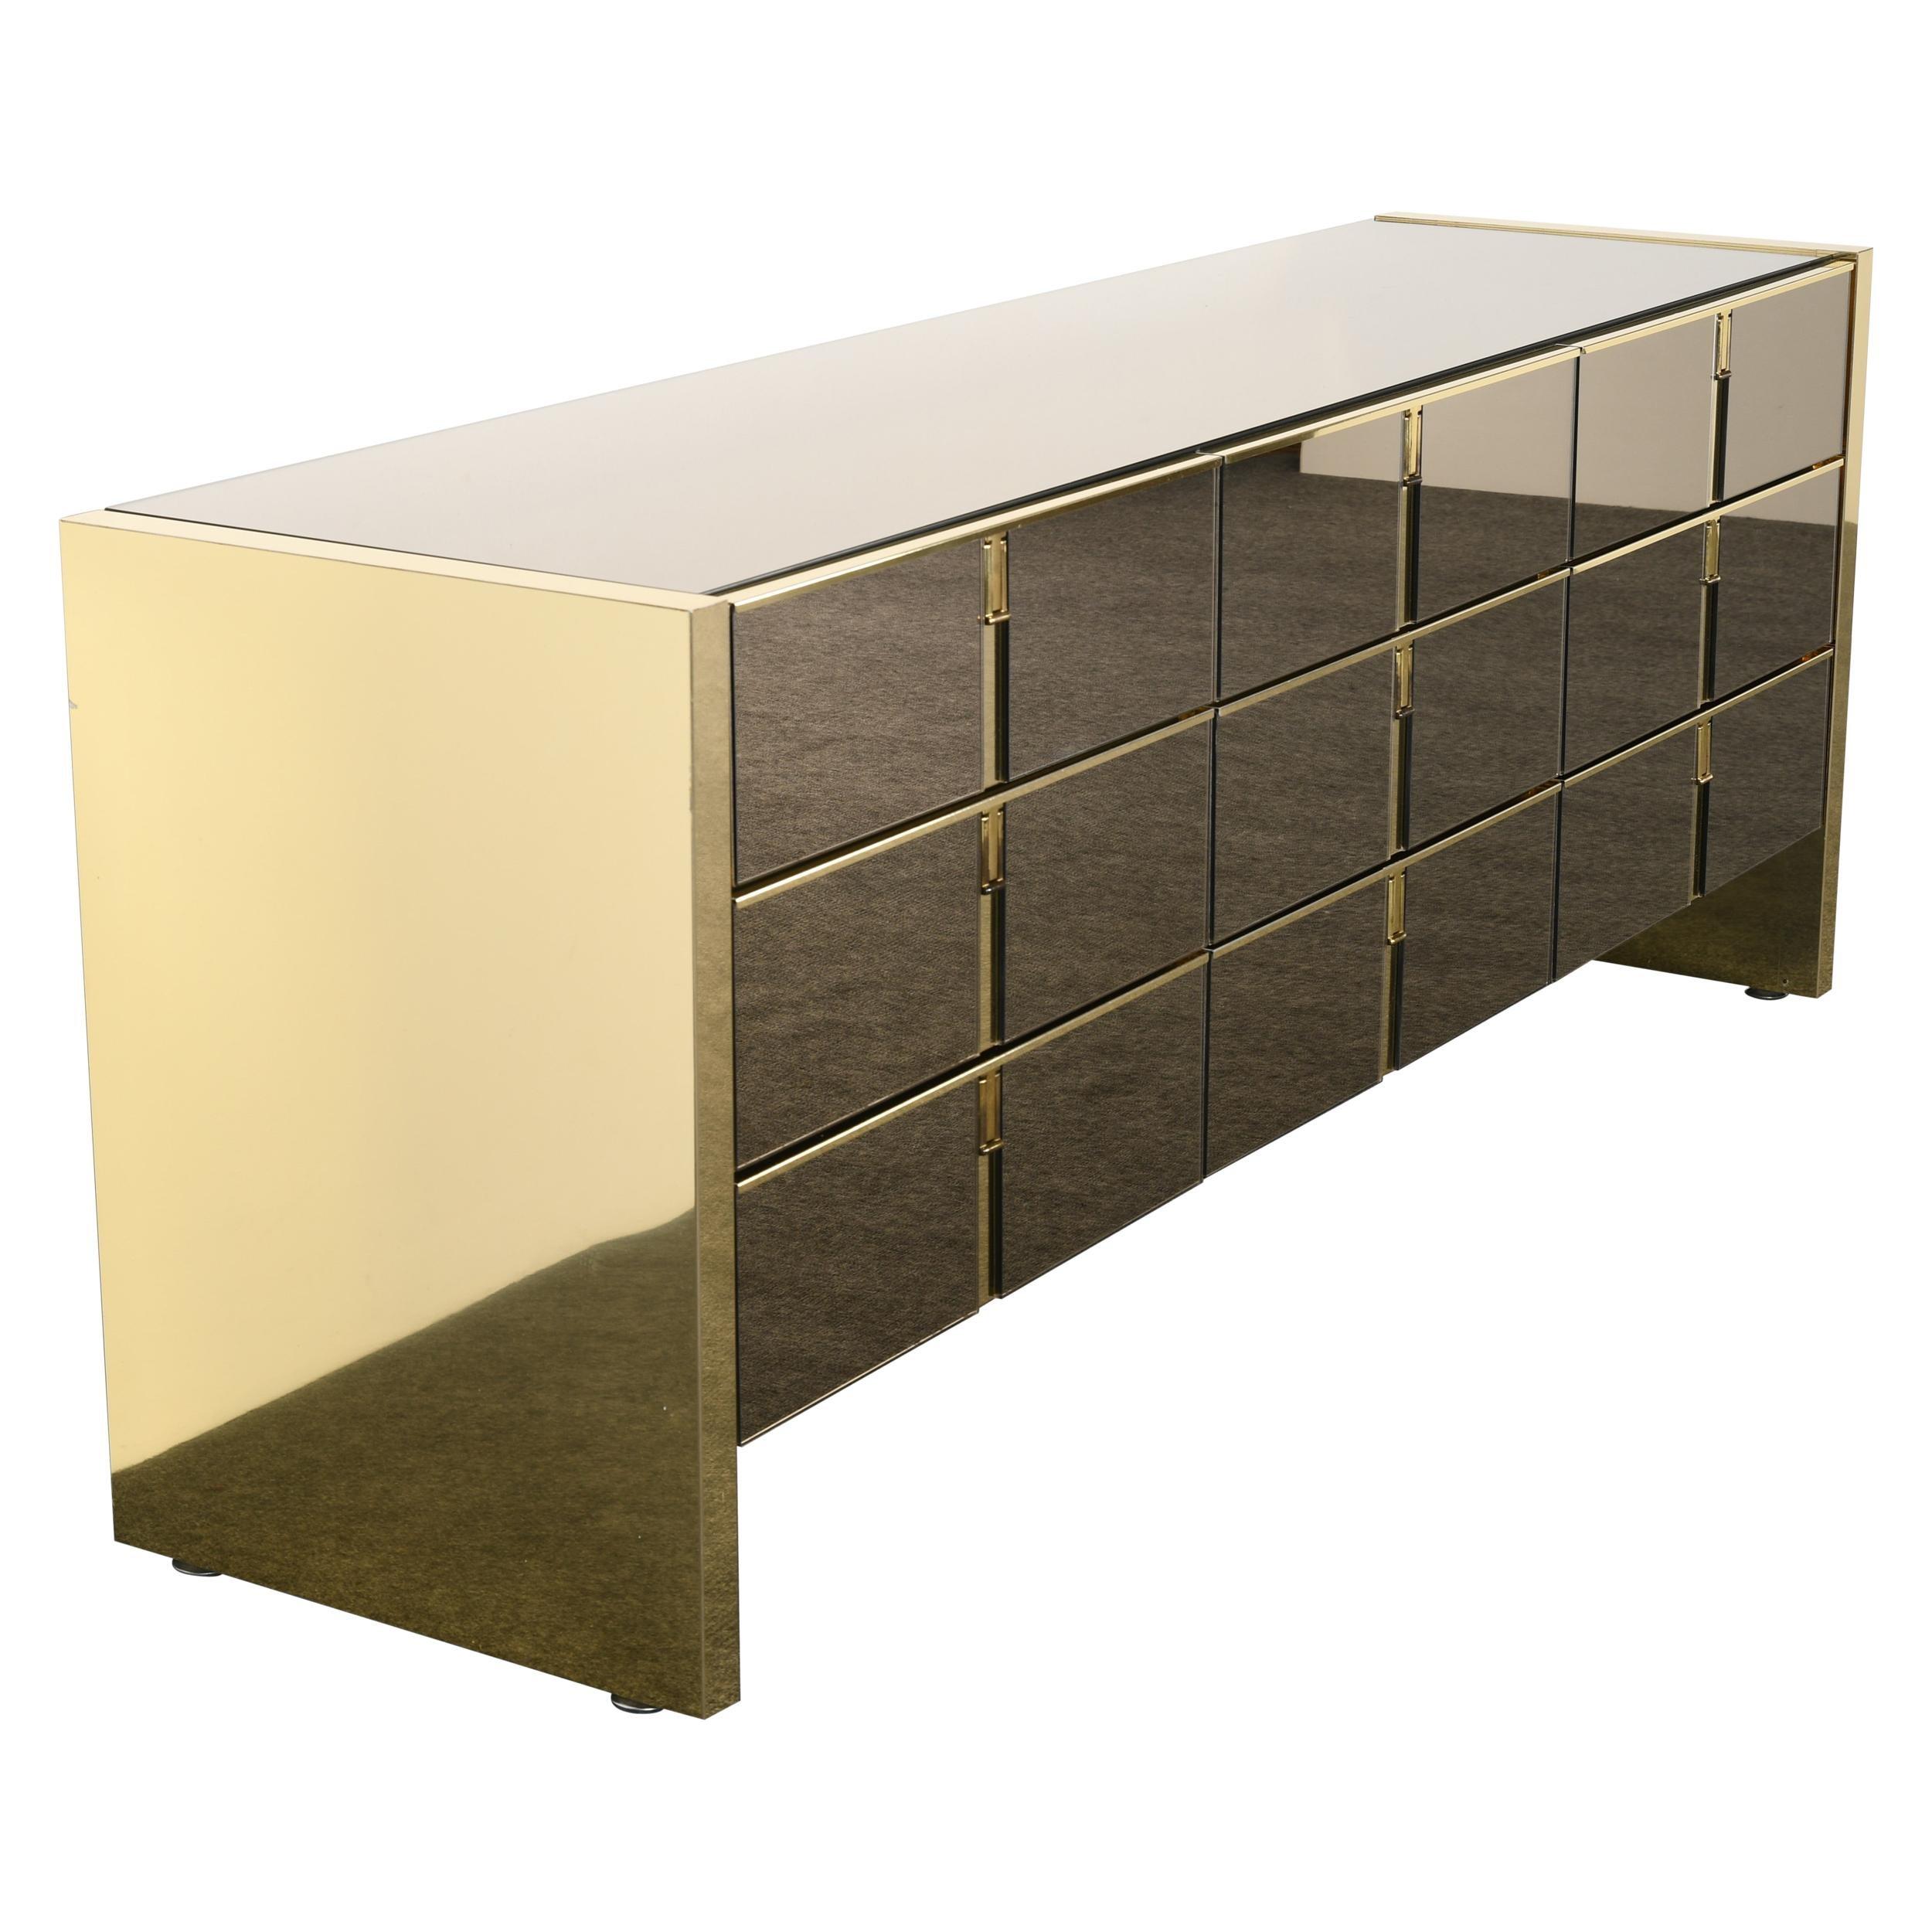 Brass and Mirror Front Dresser by Ello, 1980s